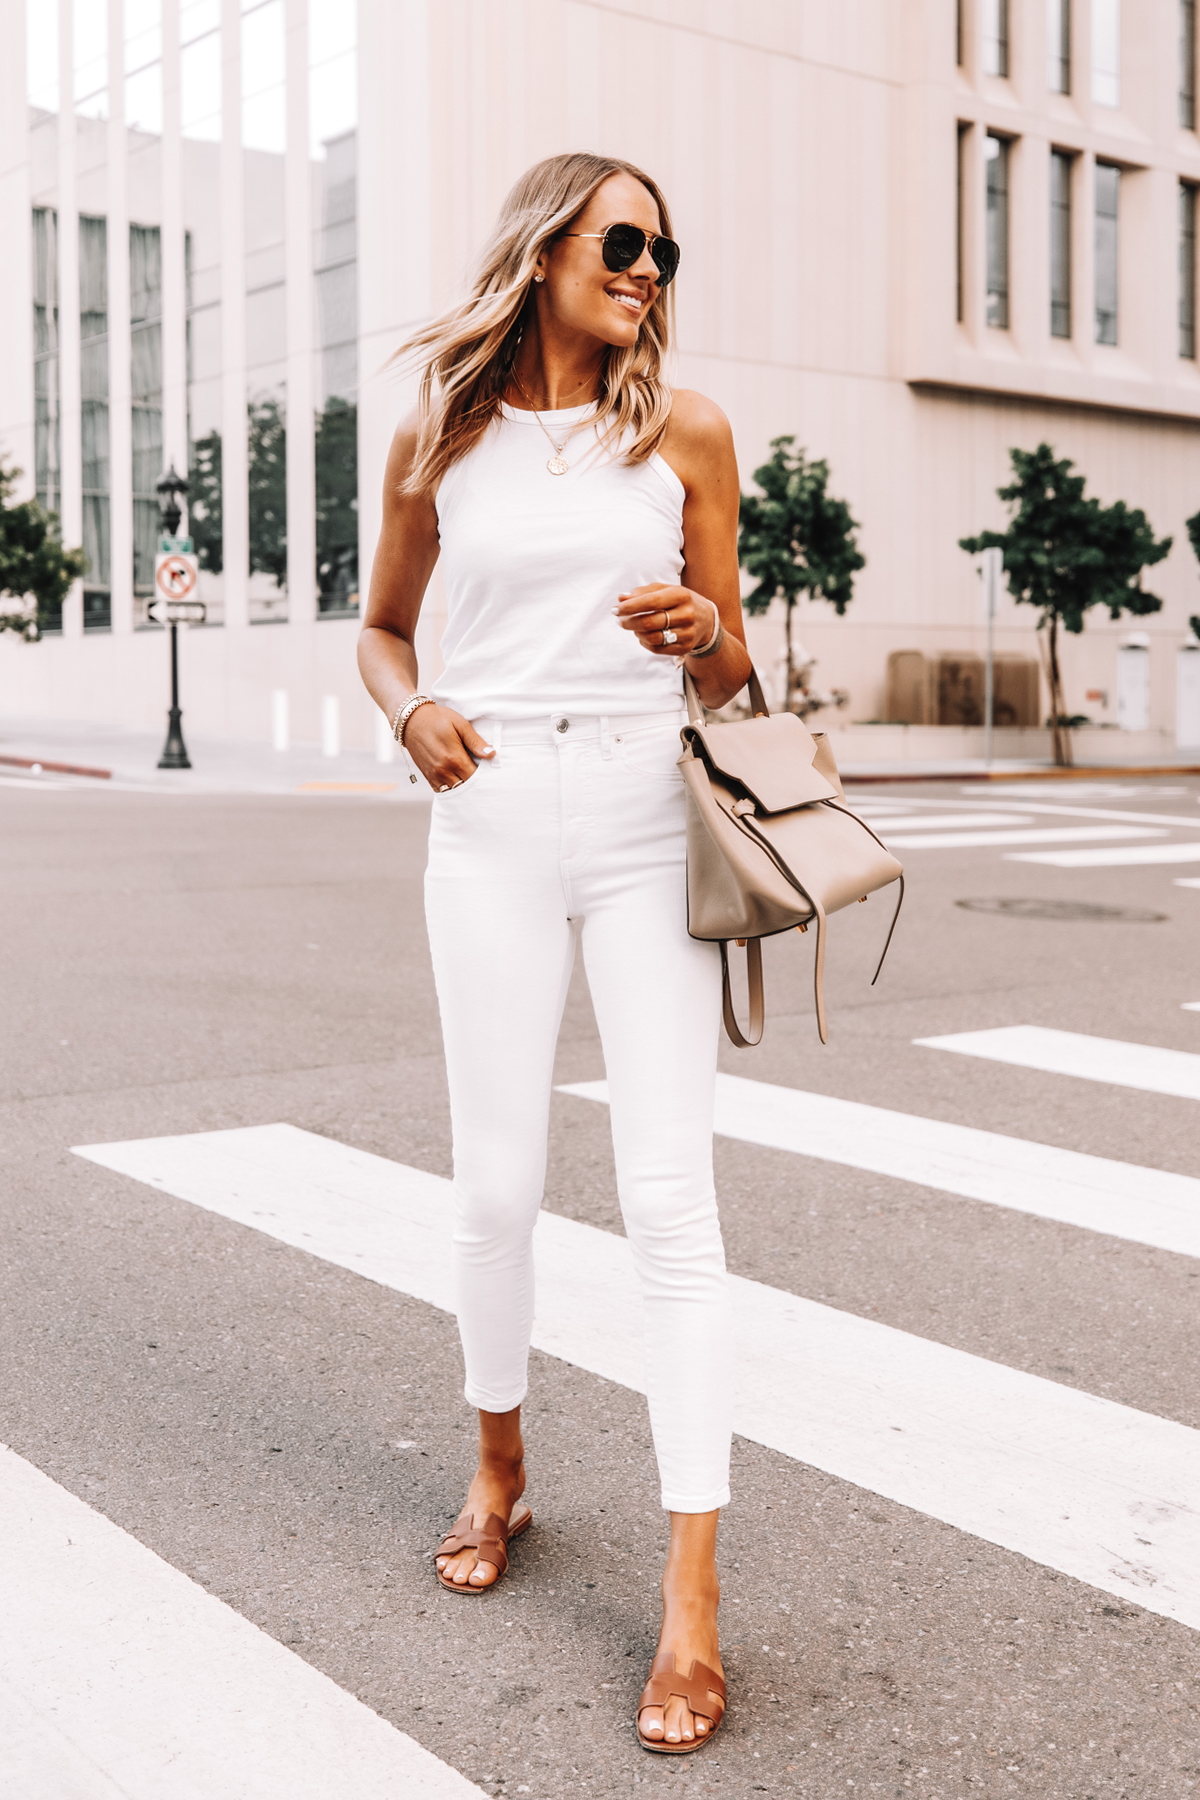 Fashion Jackson Wearing Everlane White The Organic Cotton Cutaway Tank Everlane White Skinny Jeans Hermes Sandals Celine Belt Bag